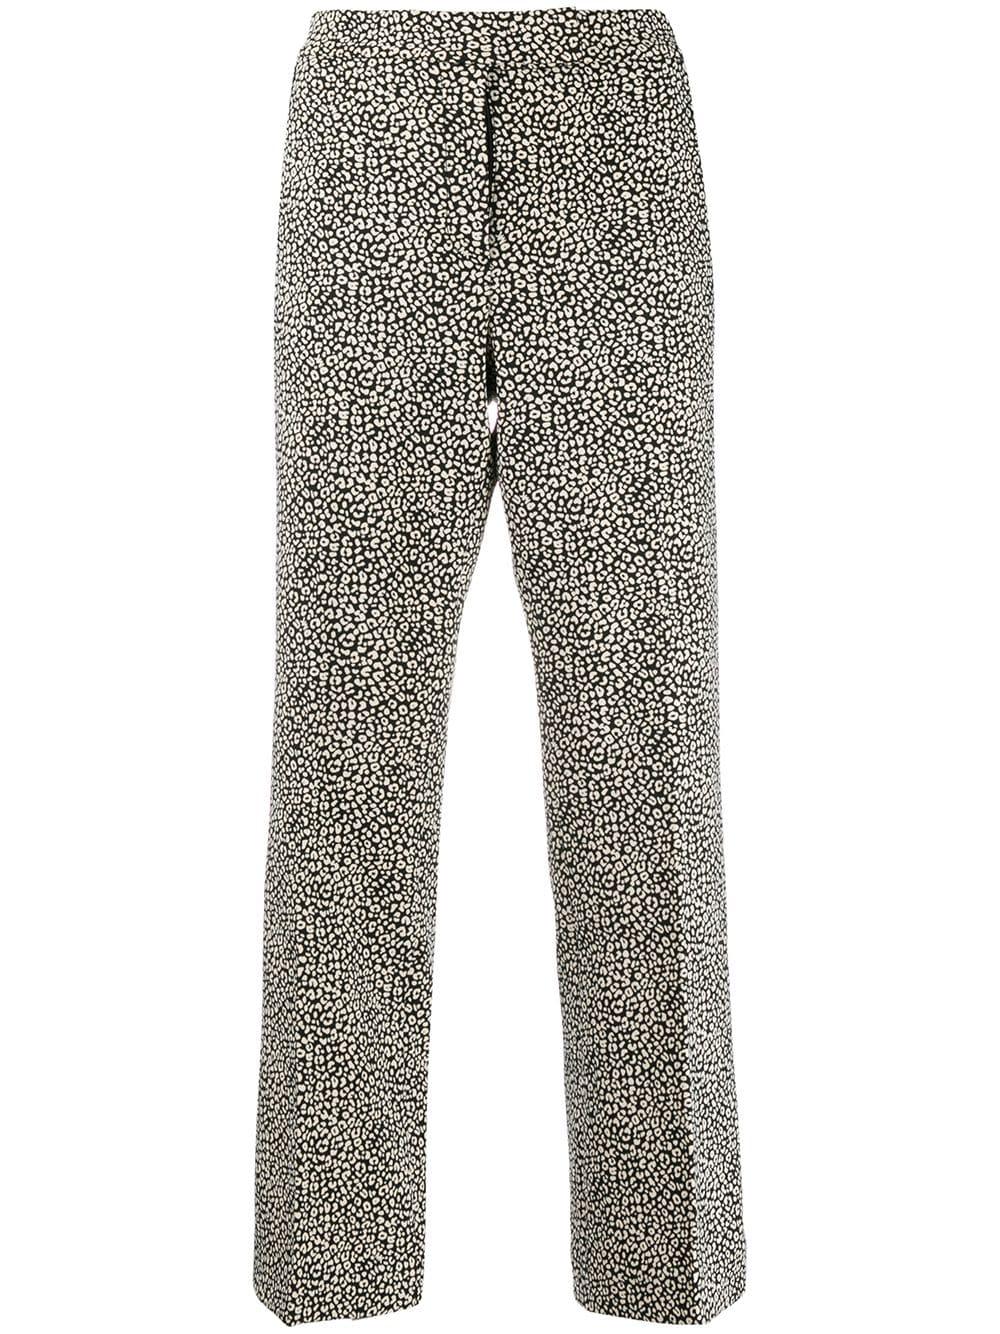 Immagine di Michael Kors | Flat Baby Cat Pants